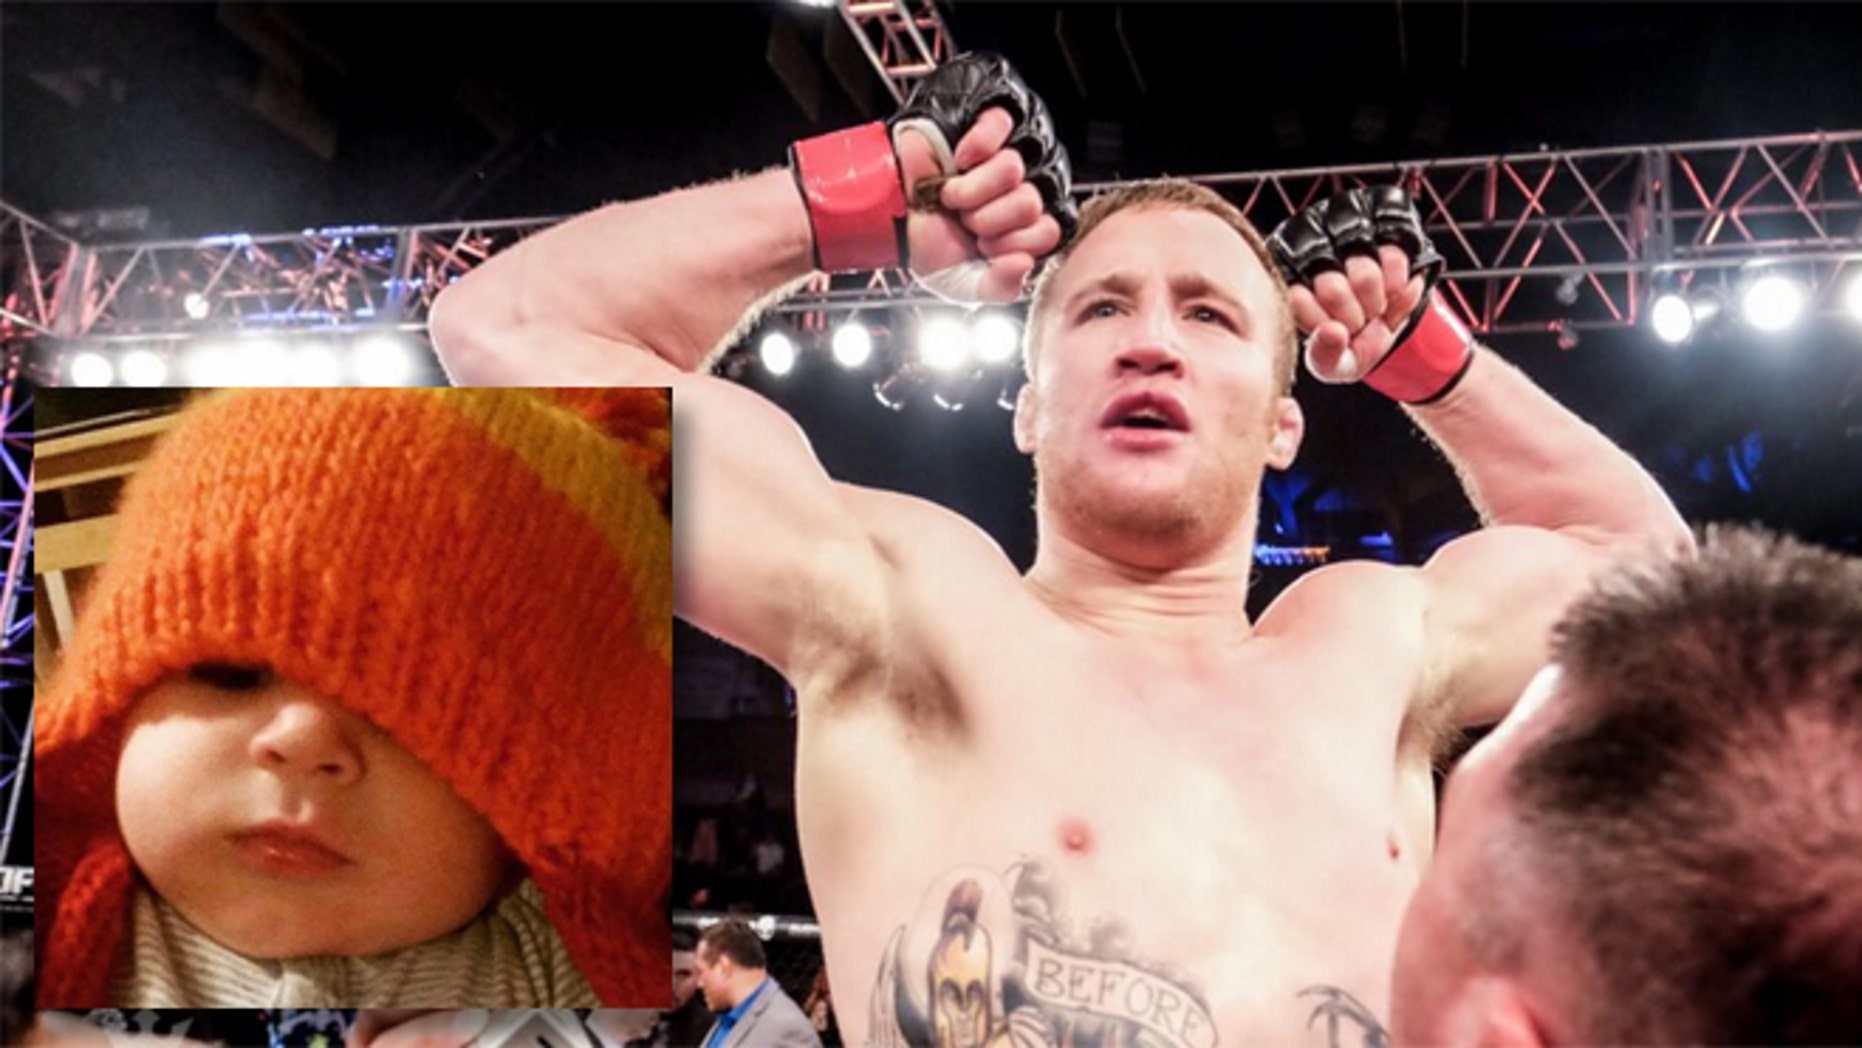 Justin Gaetjhe and Jayne Wood (inset). (Photos: Gaethje, World Series of Fighting; Wood, GoFundMe)